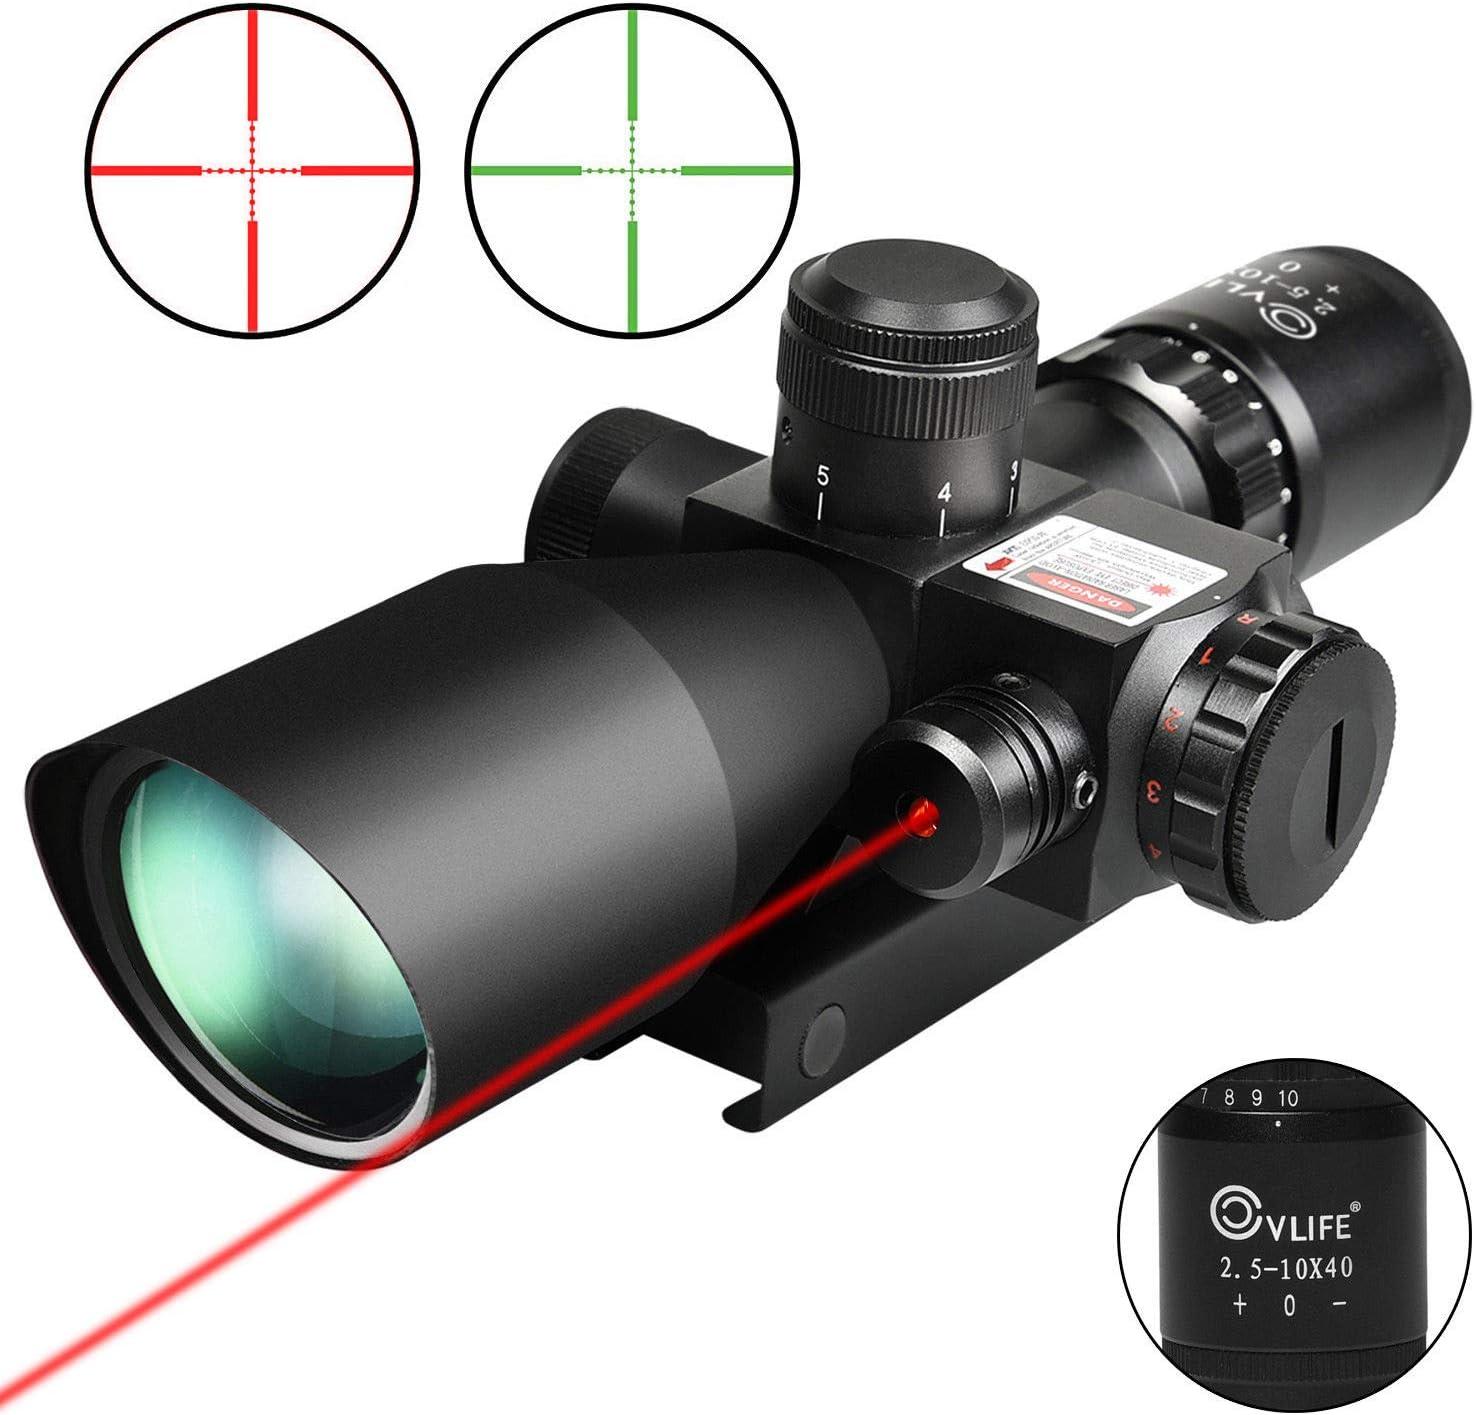 CVLIFE-Hunting-Rifle-Scope